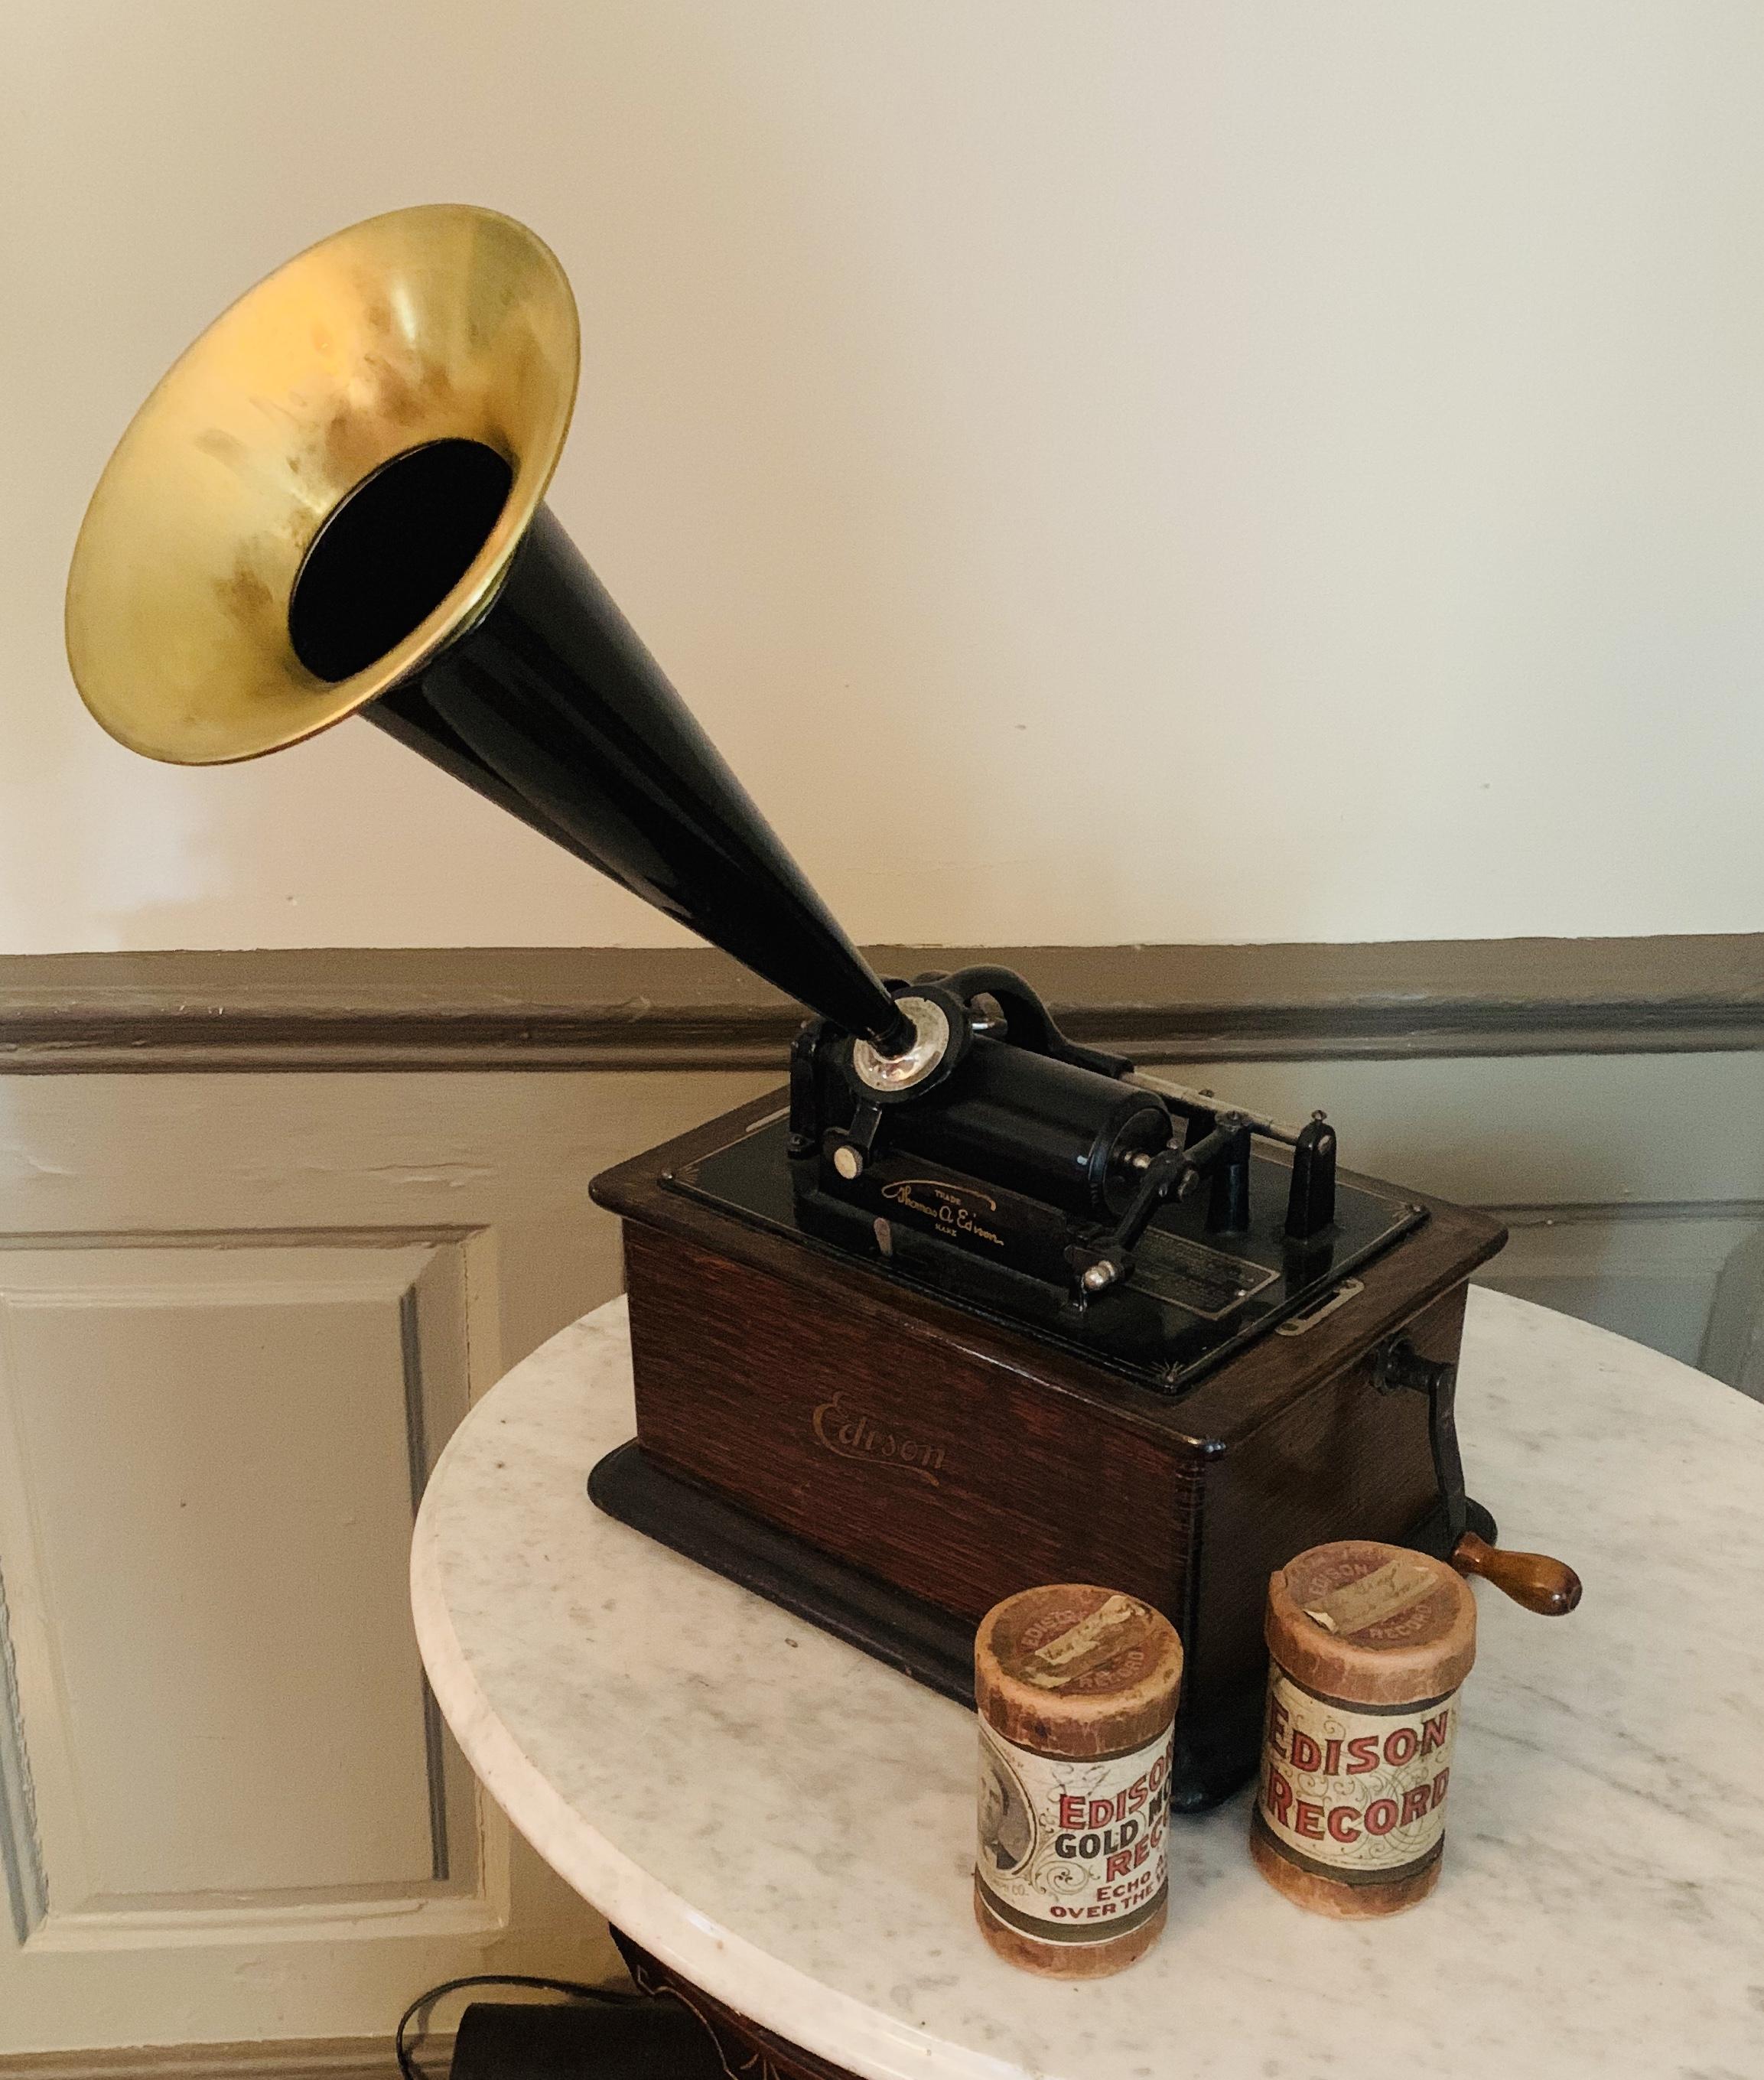 1900 Edison Phonograph